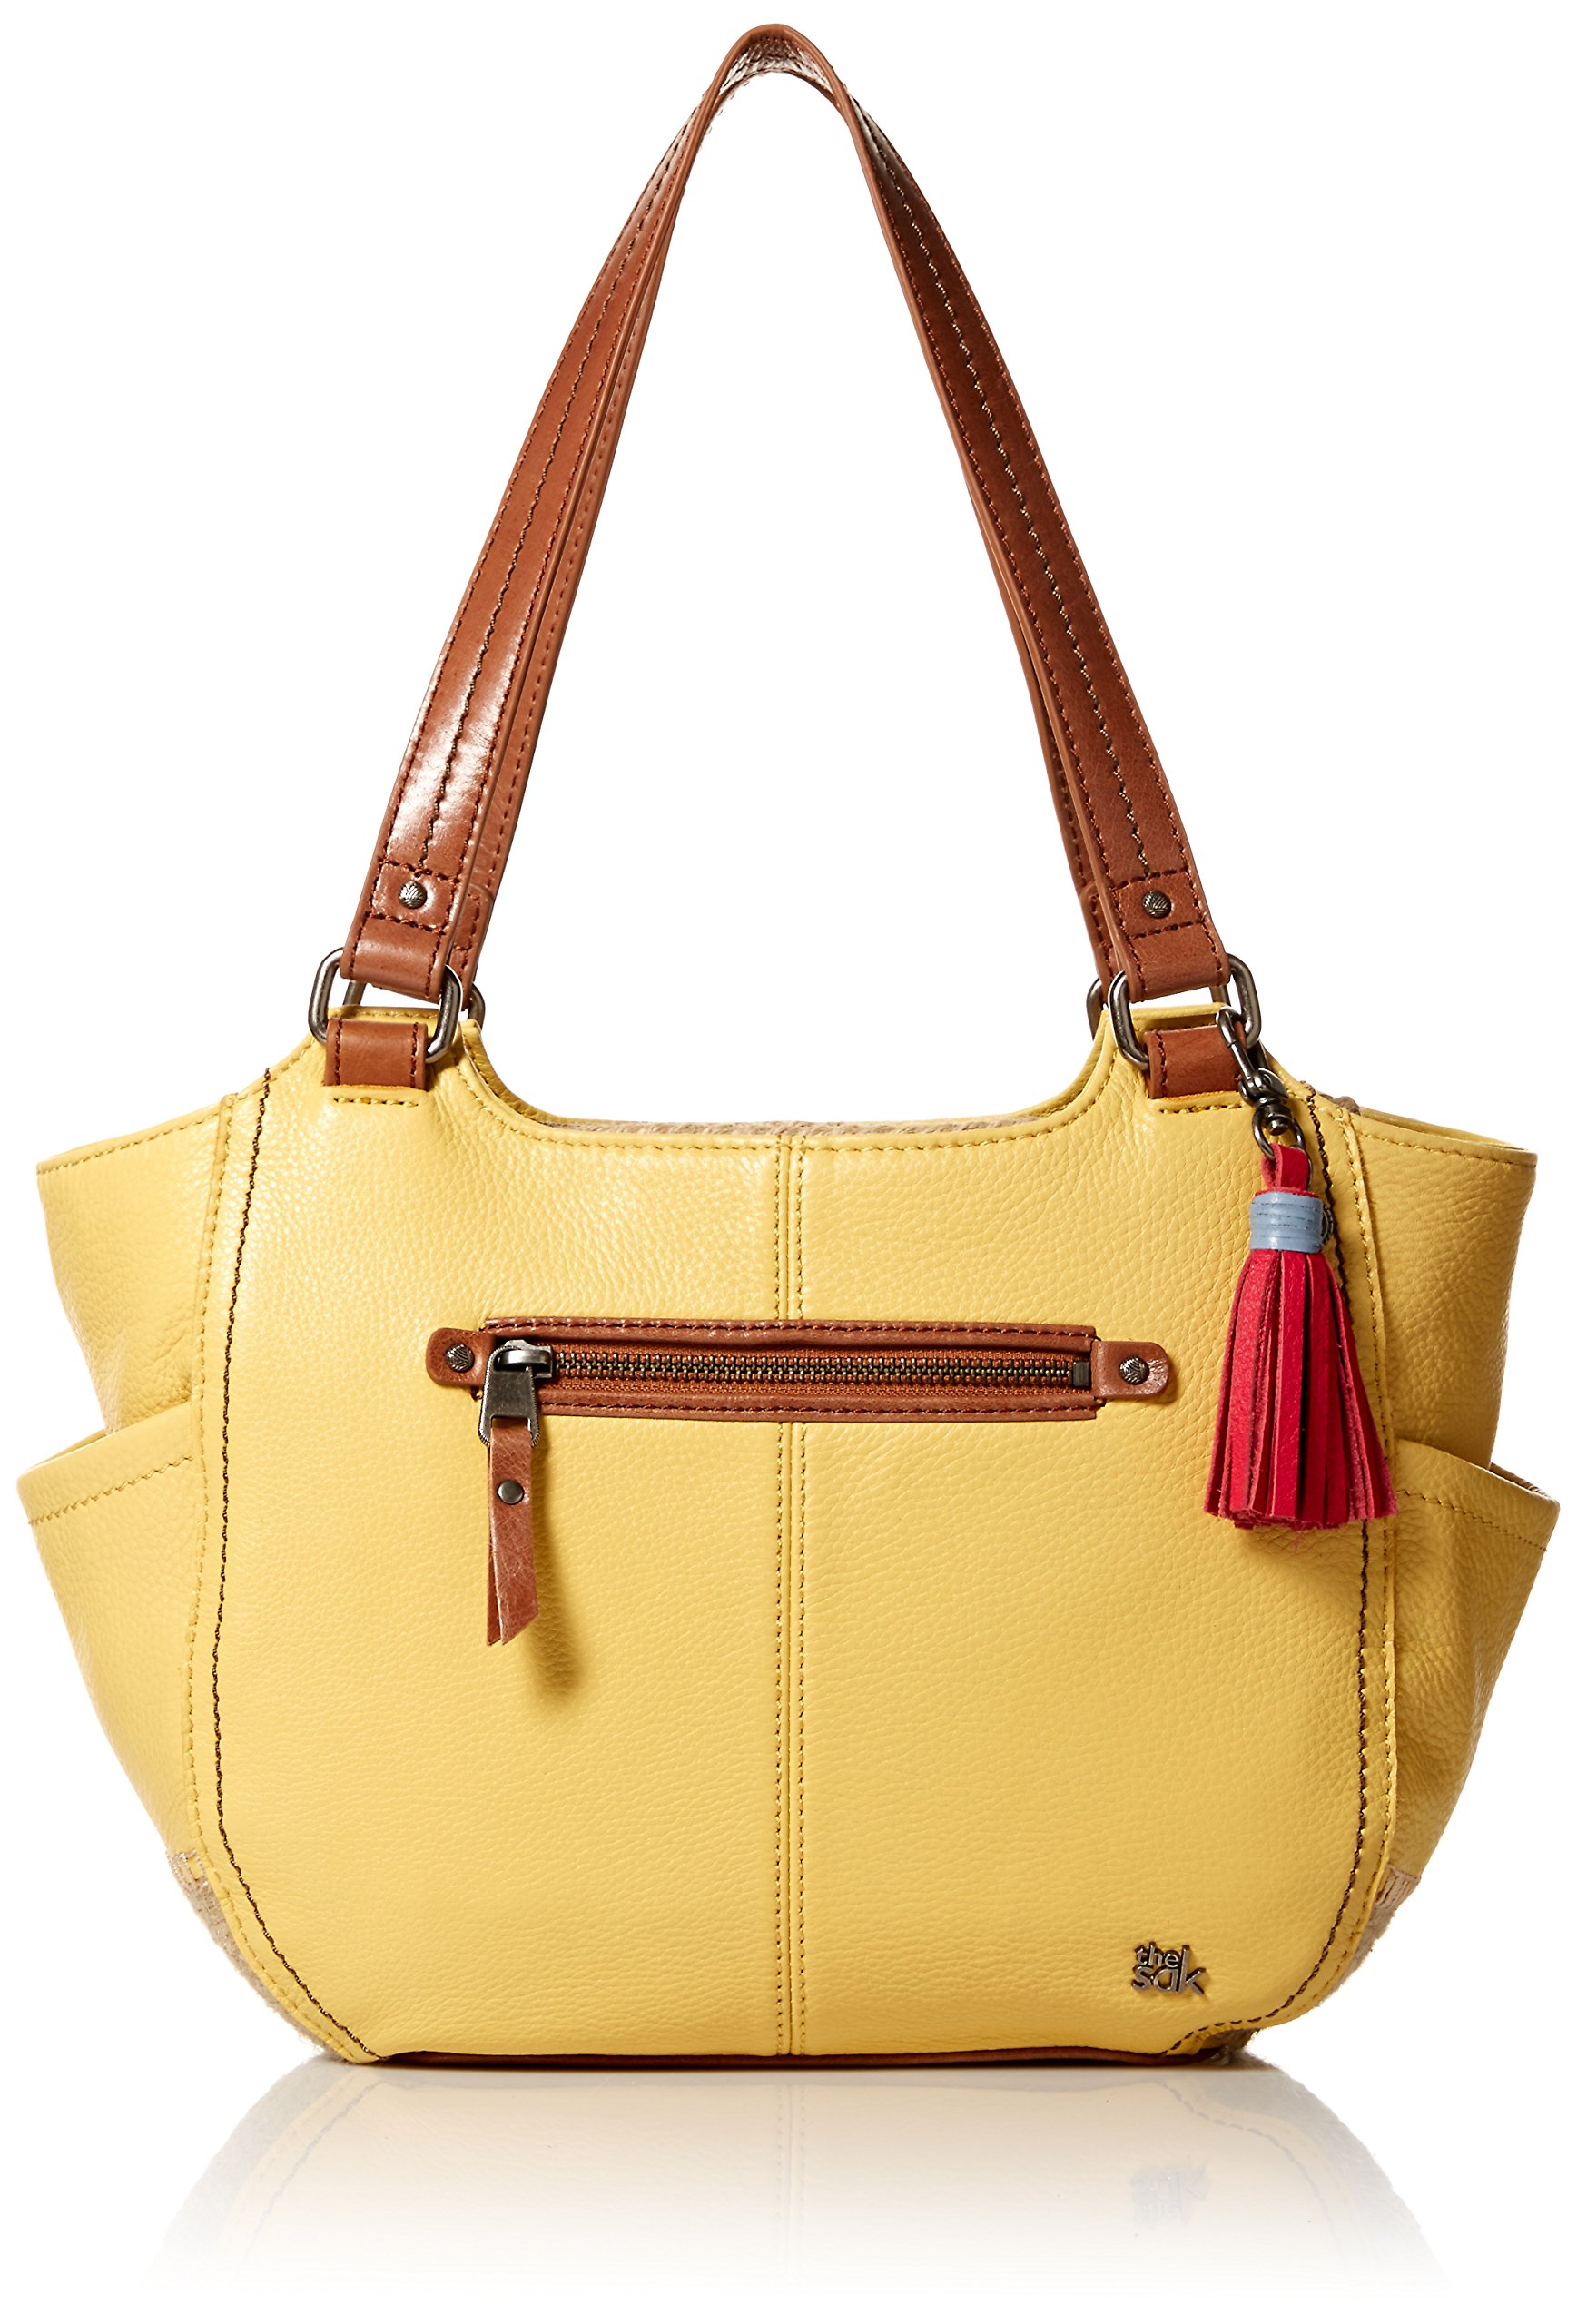 The Sak Kendra Satchel Bag, Sunlight Espadrille